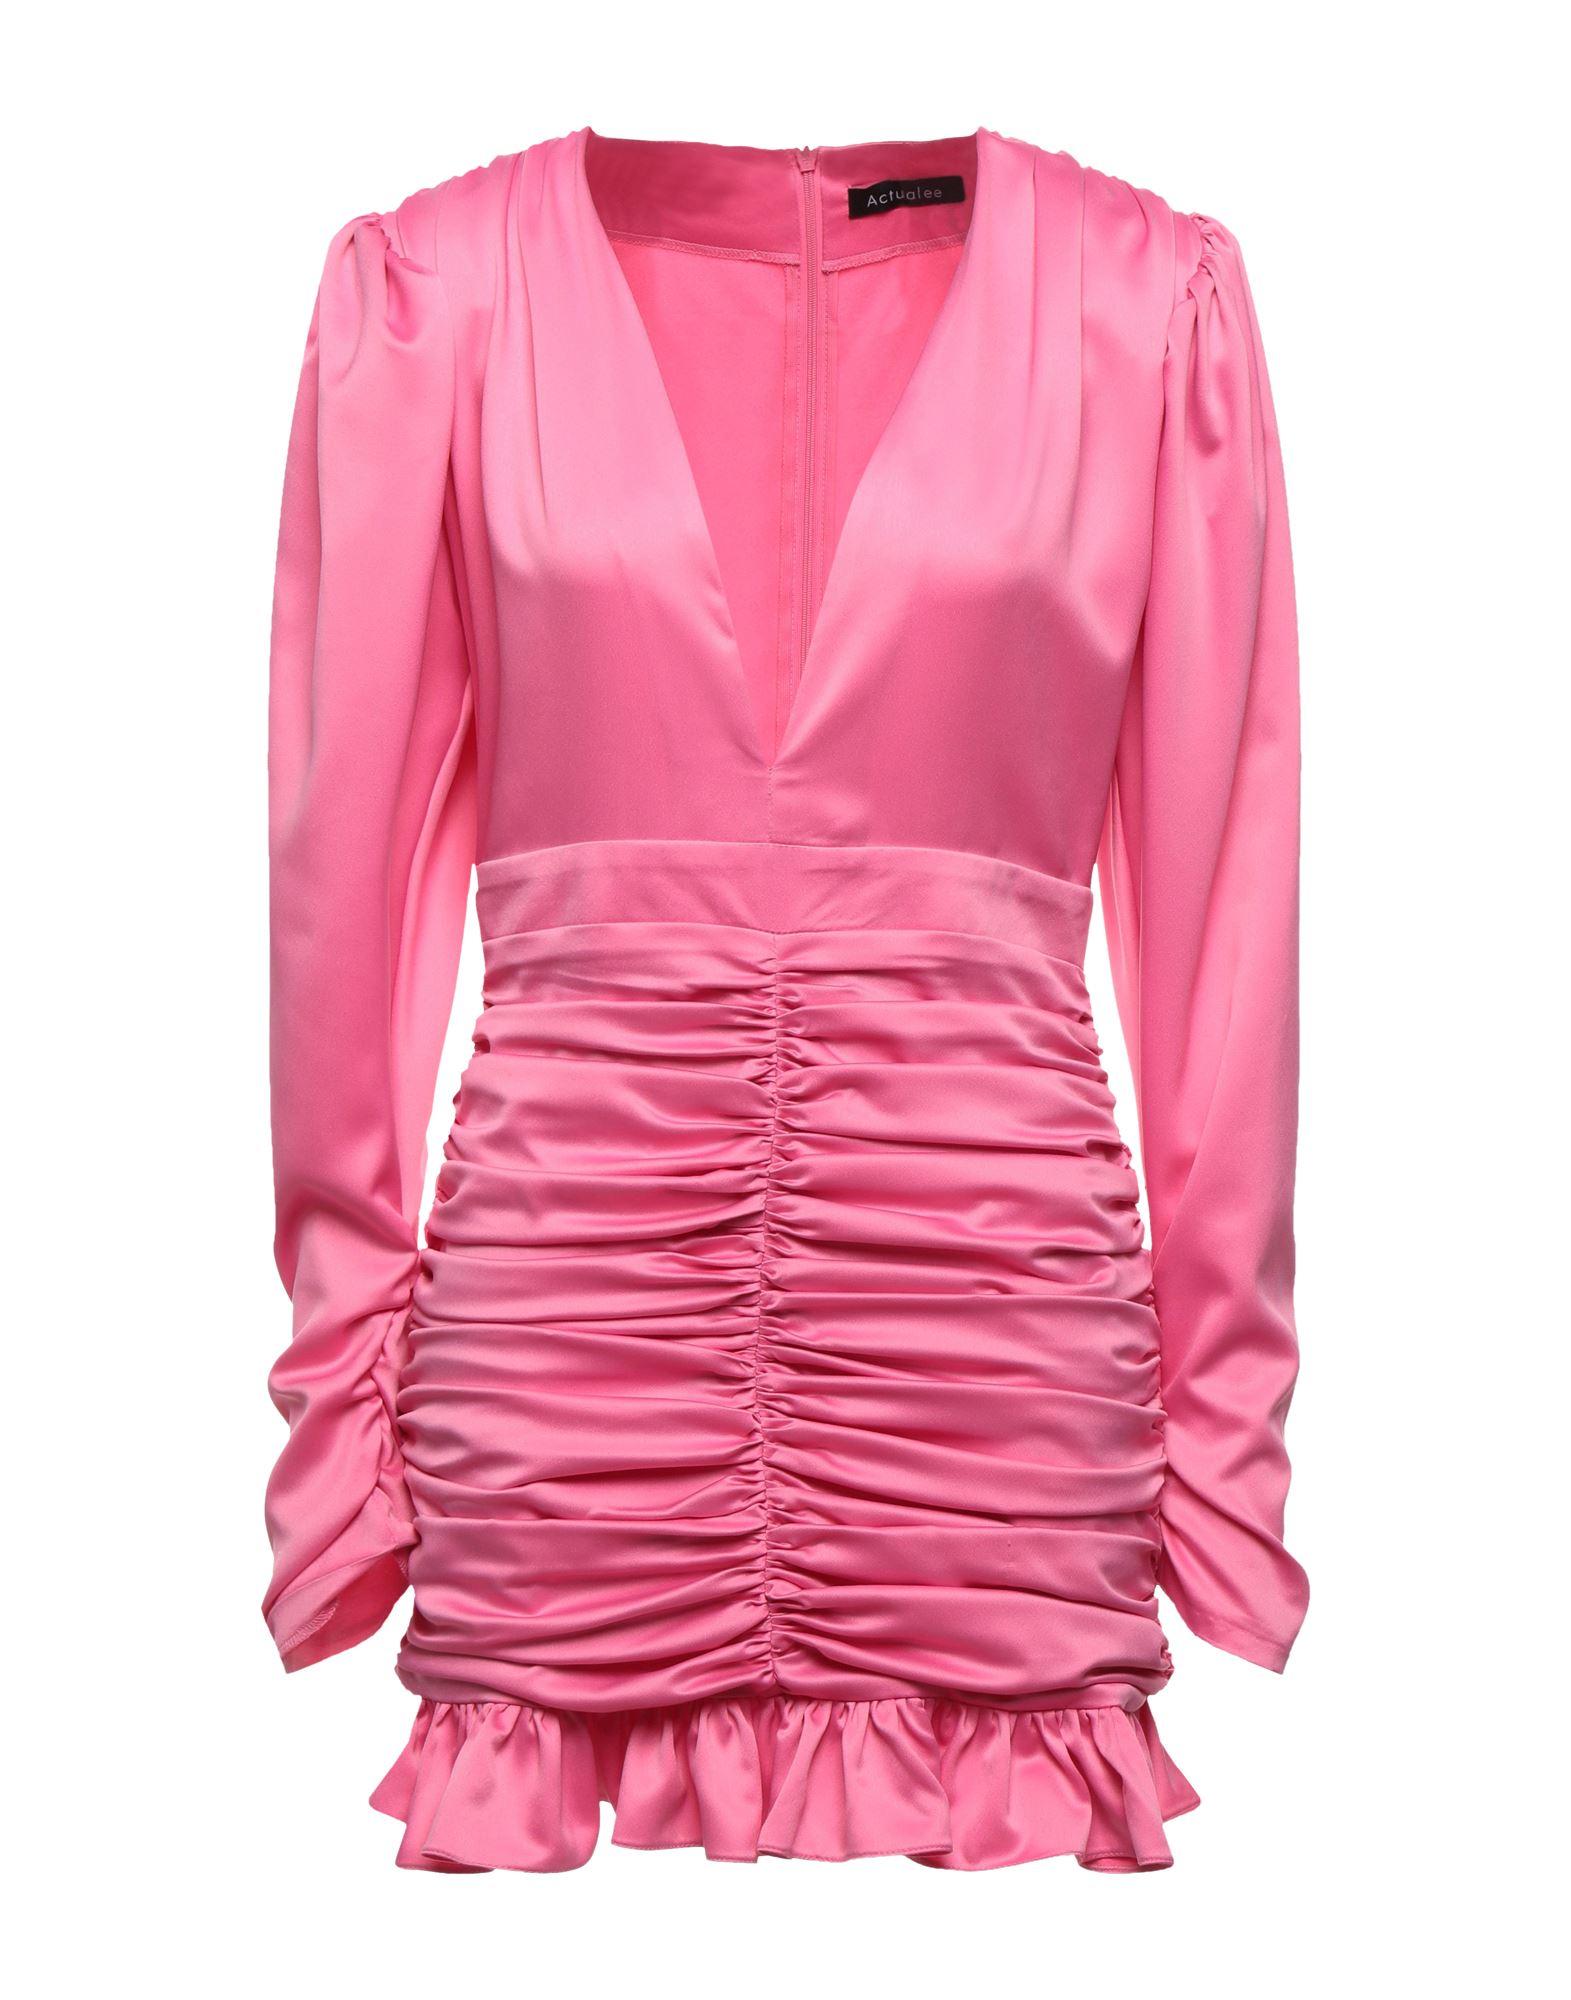 Actualee Short Dresses In Pink